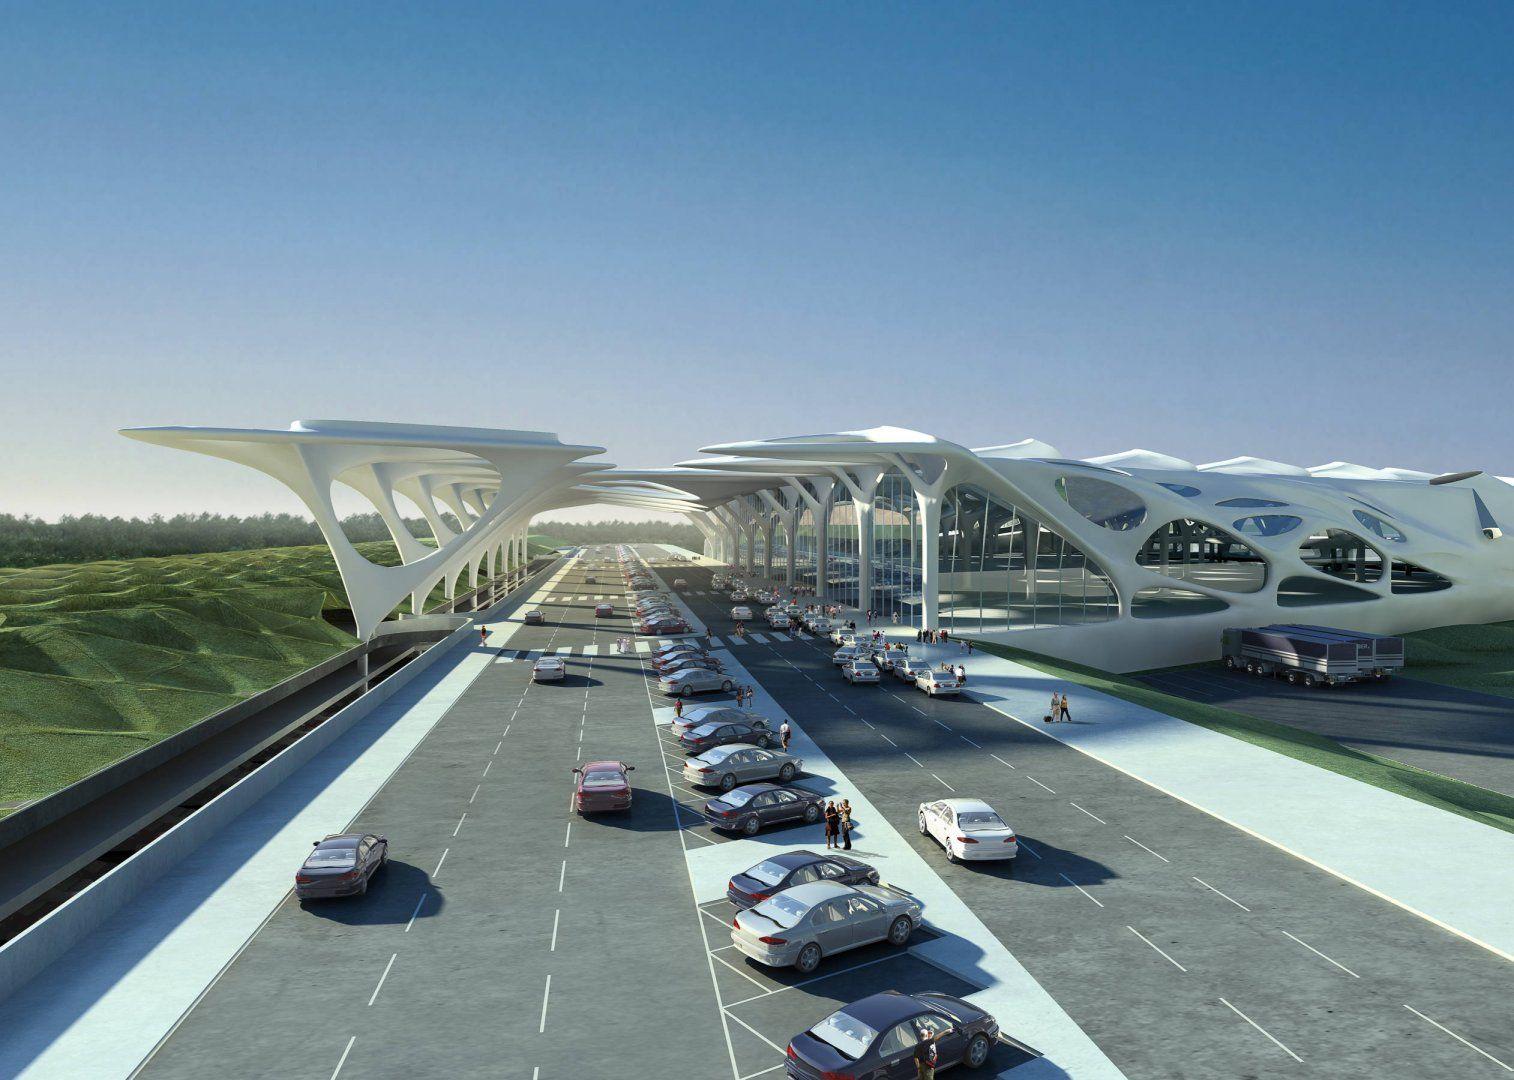 New Passenger Terminal And Masterplan Zagreb Airport Masterplans Zaha Hadid Architects Arquitetura Futuristica Arquitetura Design